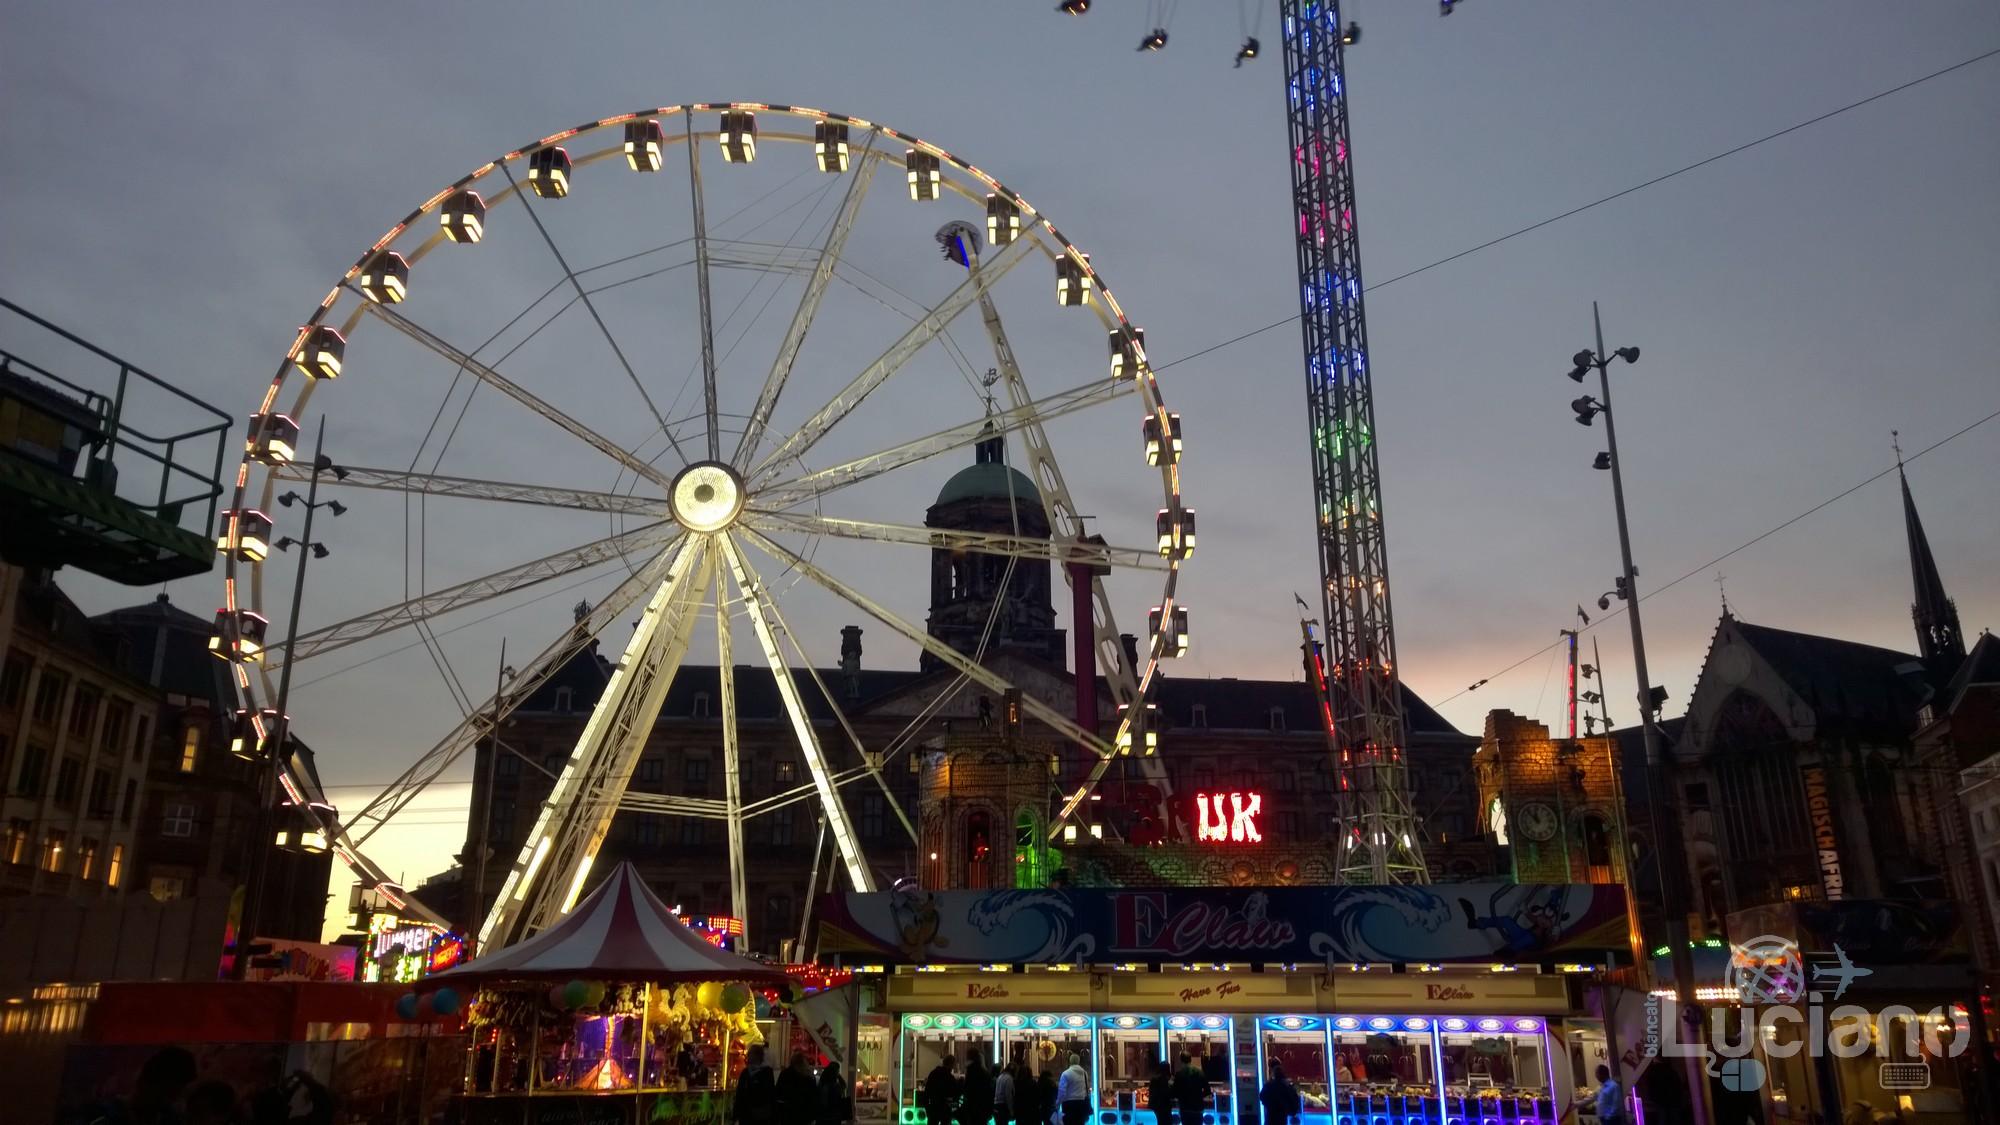 amsterdam-2014-vueling-lucianoblancatoit (30)